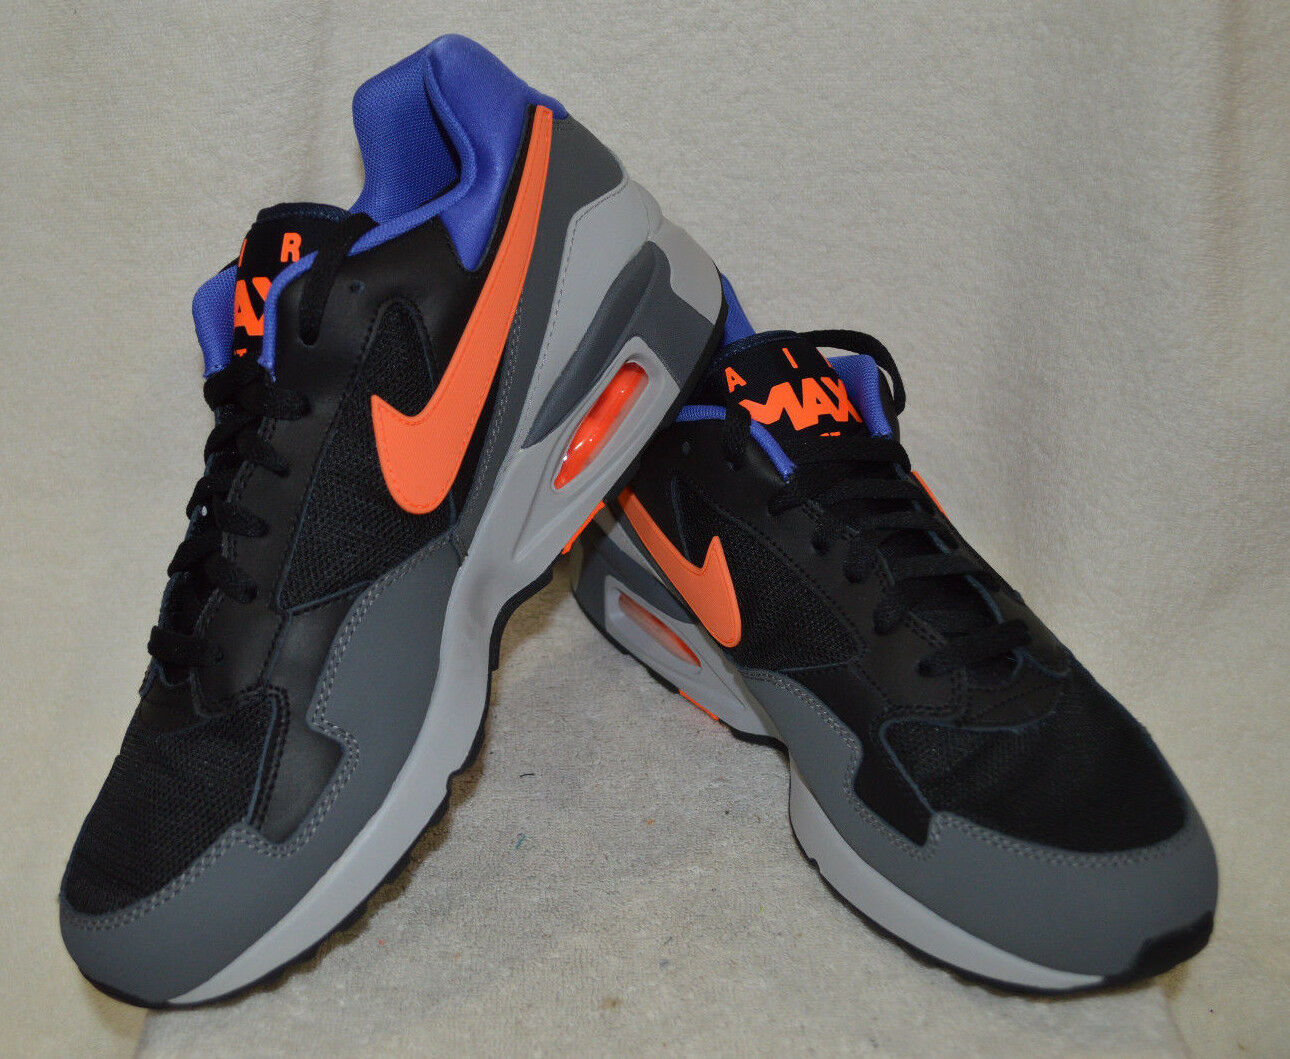 Nike Air Grey Max ST Black/Hyper Crimson/Dark Grey Air Men's Sneakers - Size 9.5 NWB fe7c15